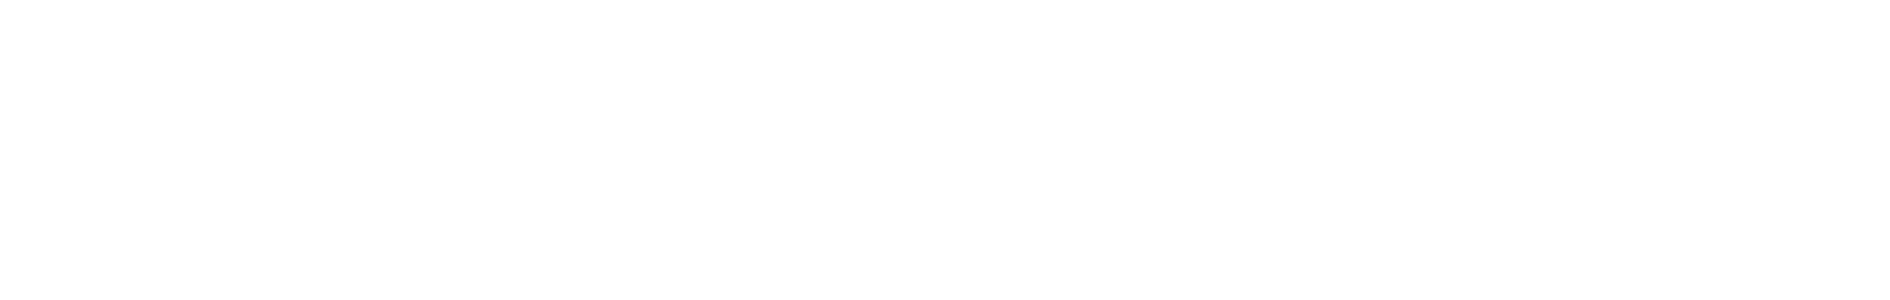 Munk School of Global Affairs & Public Policy   University of Toronto